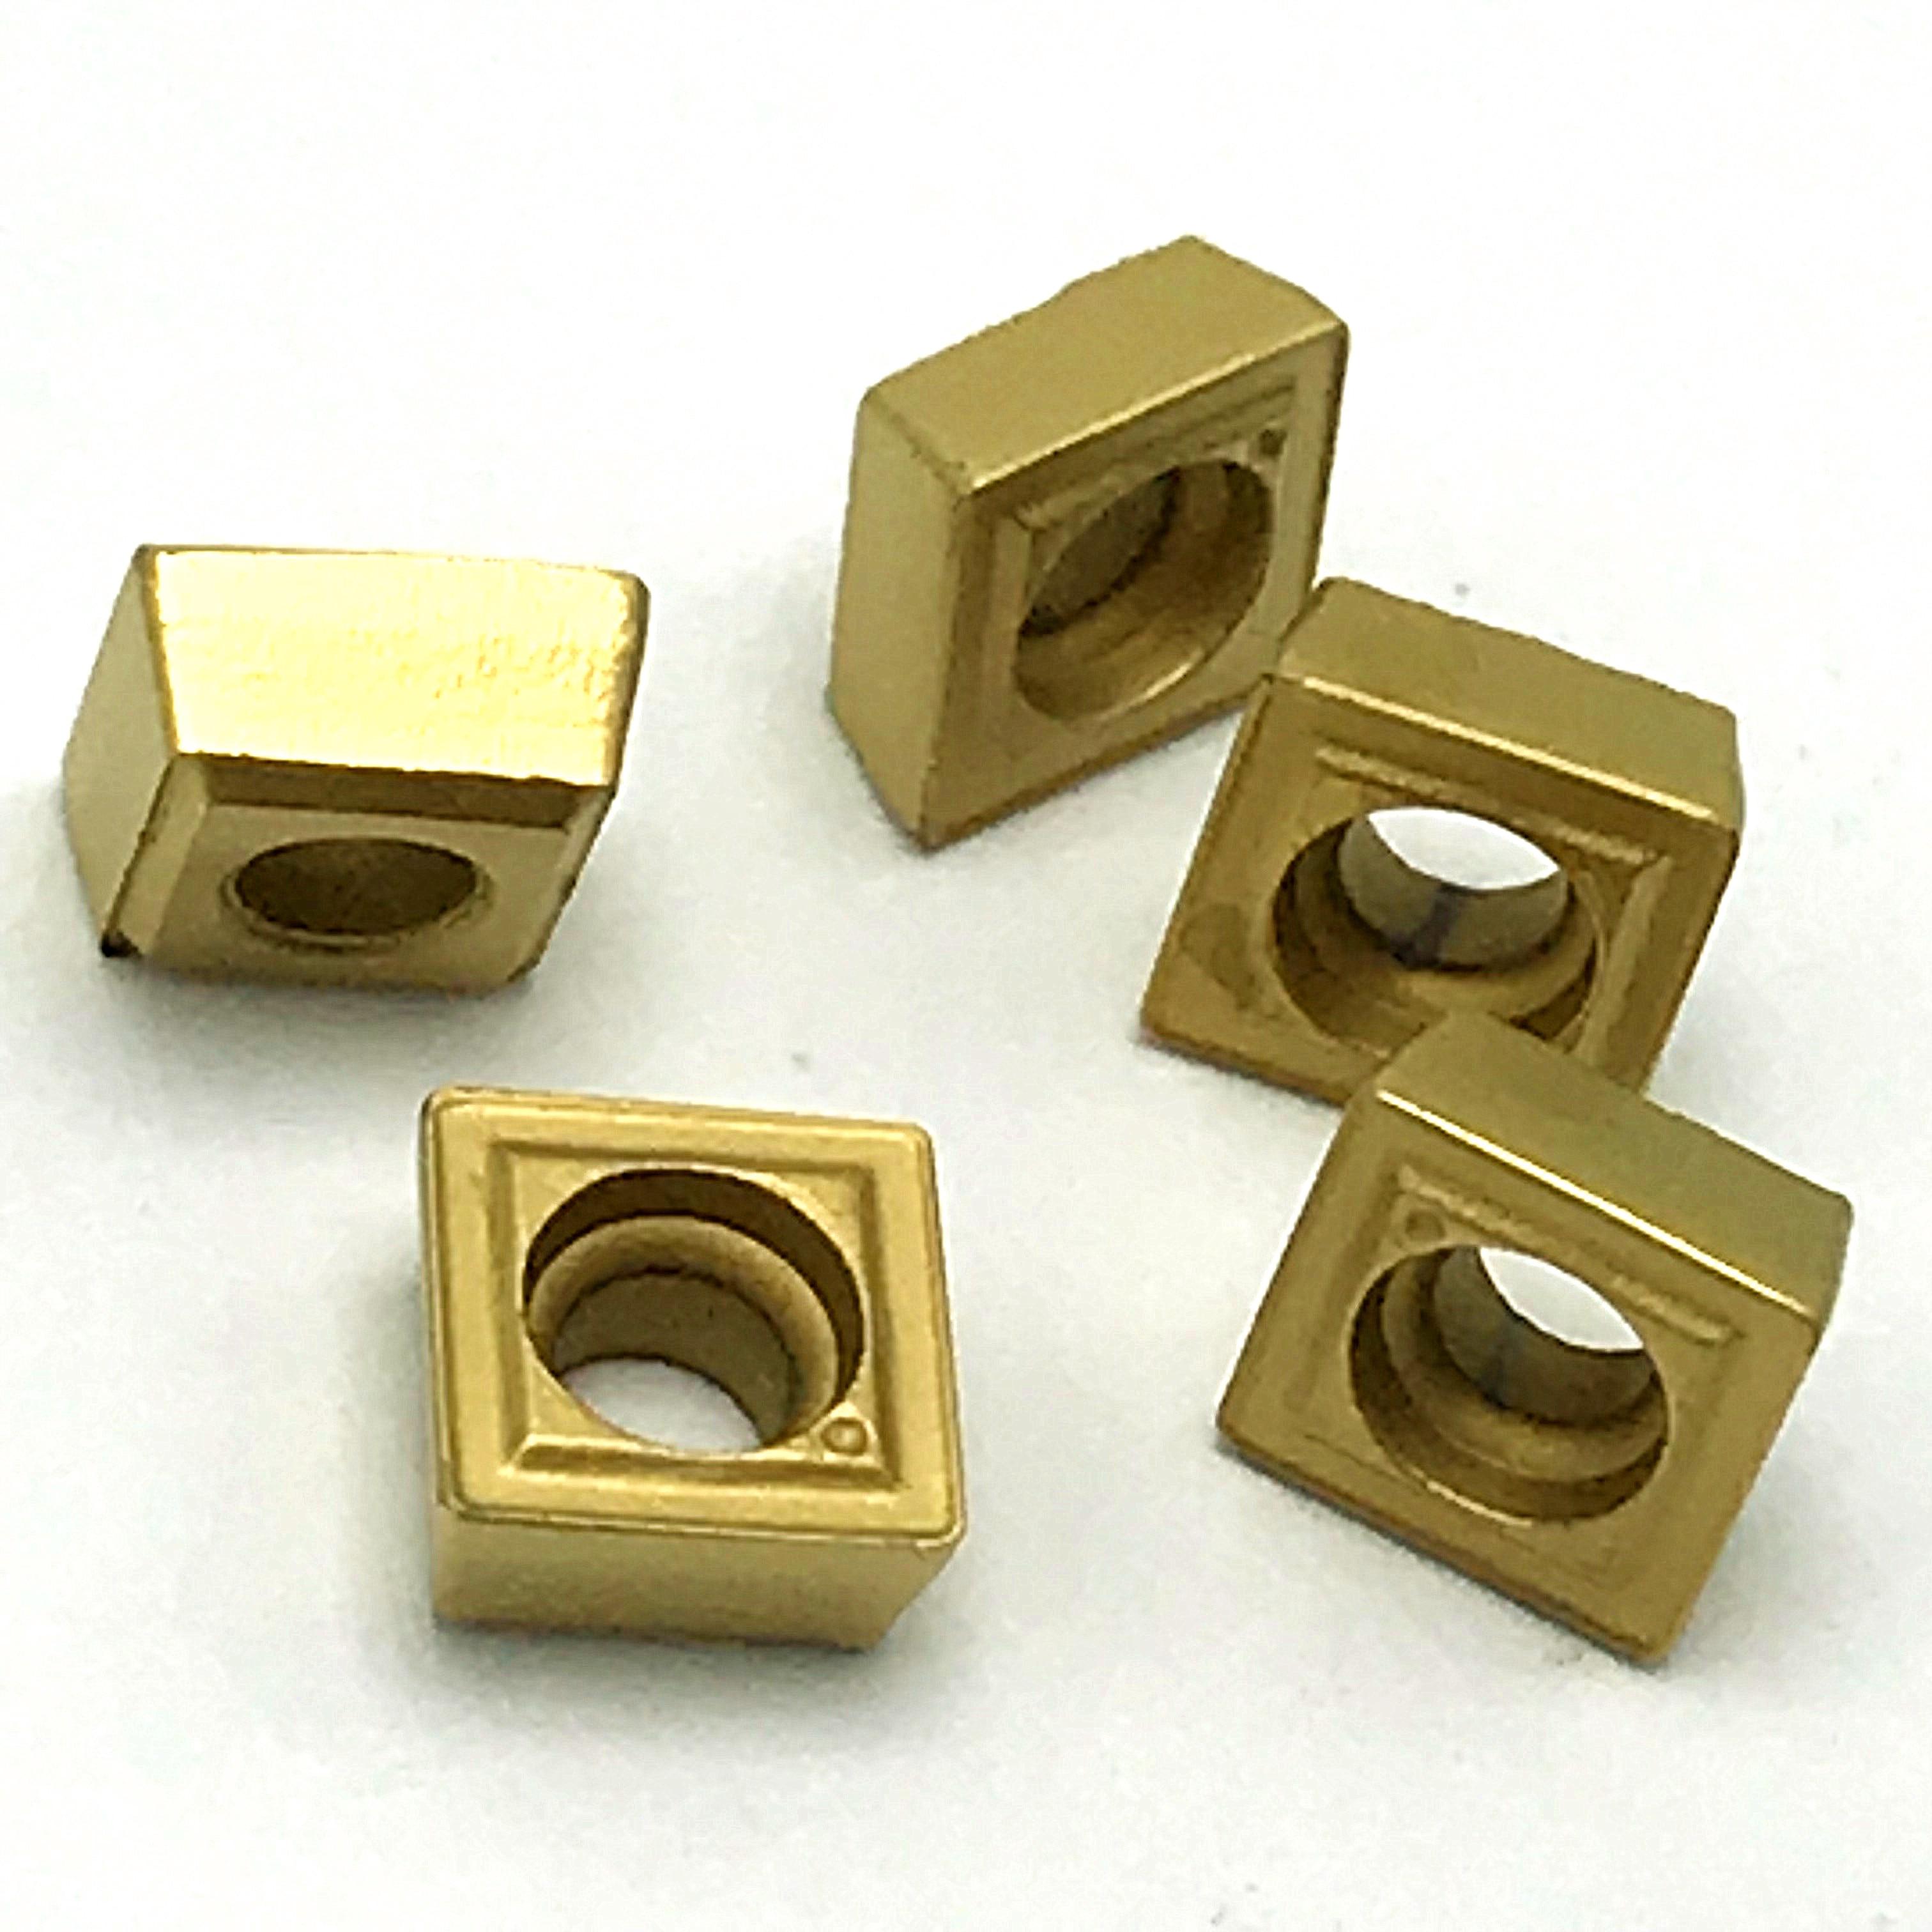 Купить с кэшбэком Tungsten Carbide SPMG050204 TT8020 TT9030 lathe turning tool carbide inserts Hard Alloy insert  U drills Milling cutter